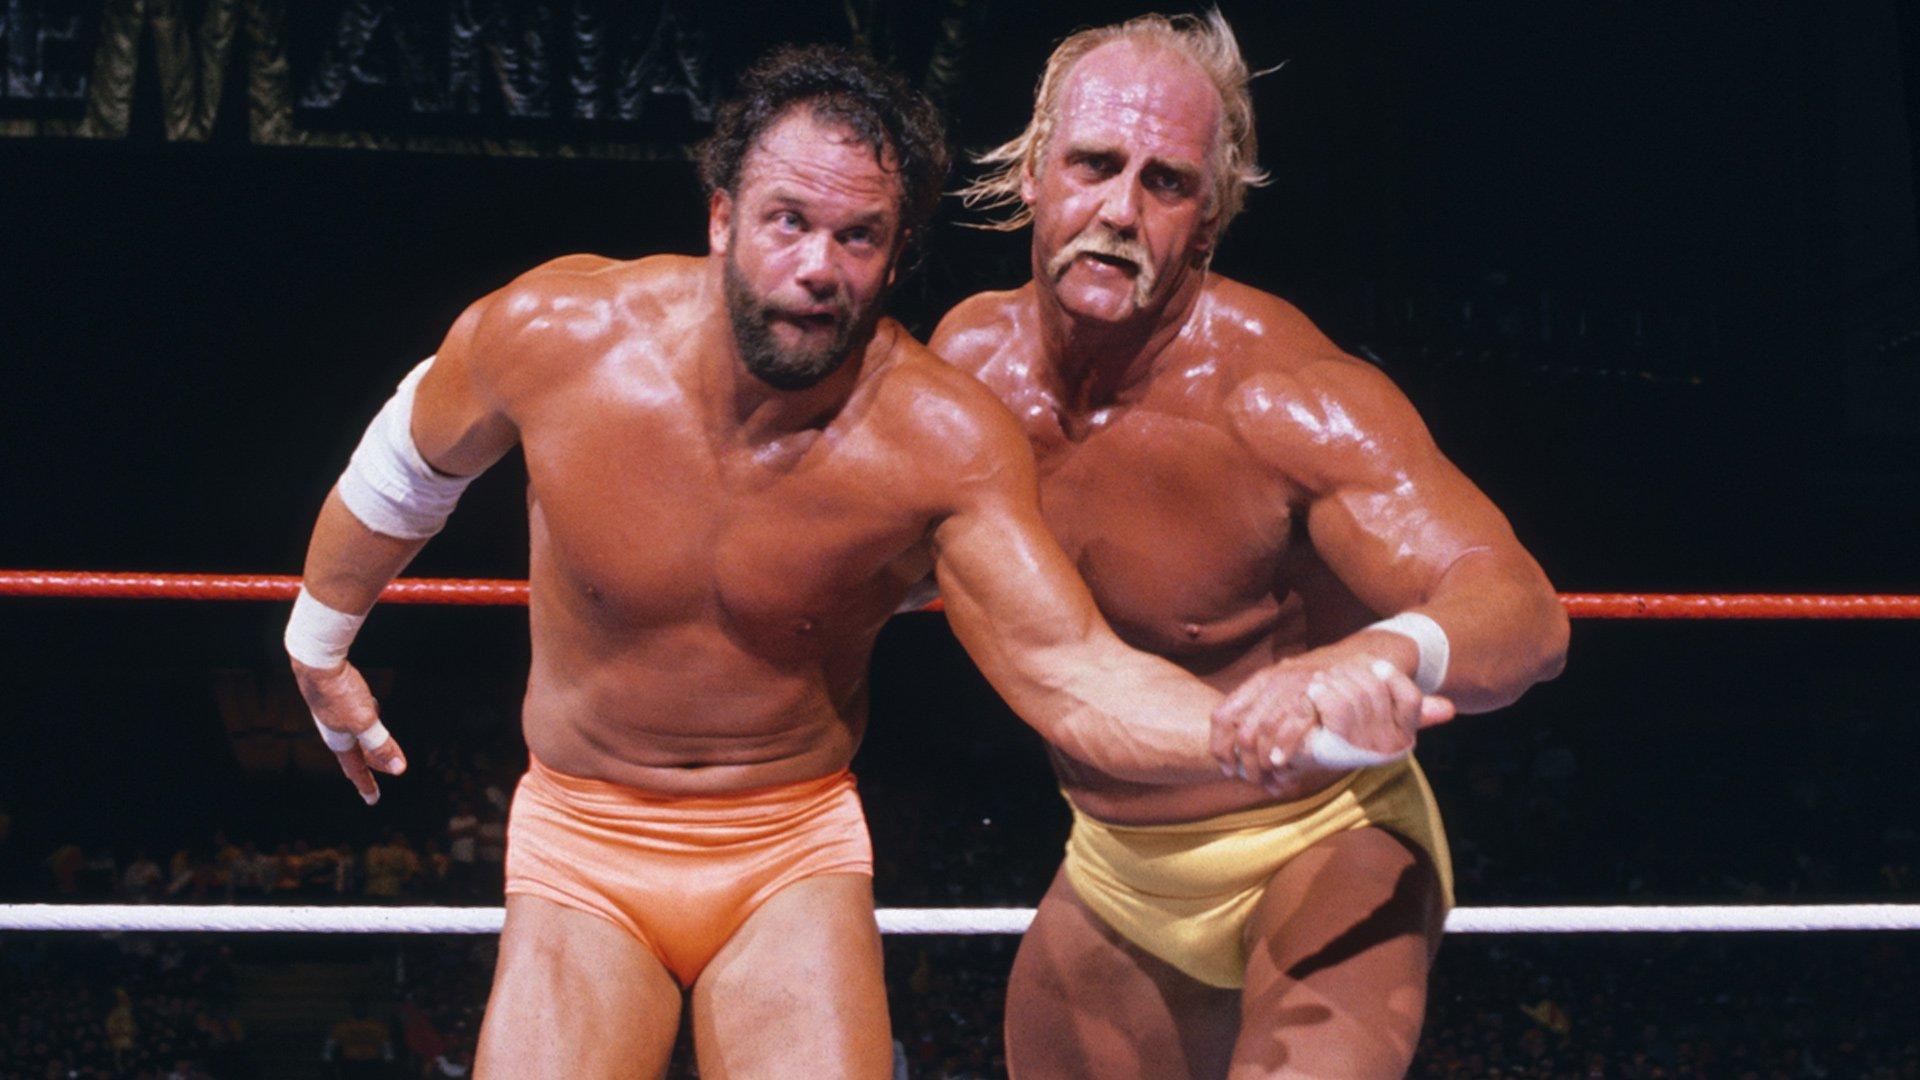 Hulk Hogan Vs Spider Man 1 Randy Savage 2170804 Hd